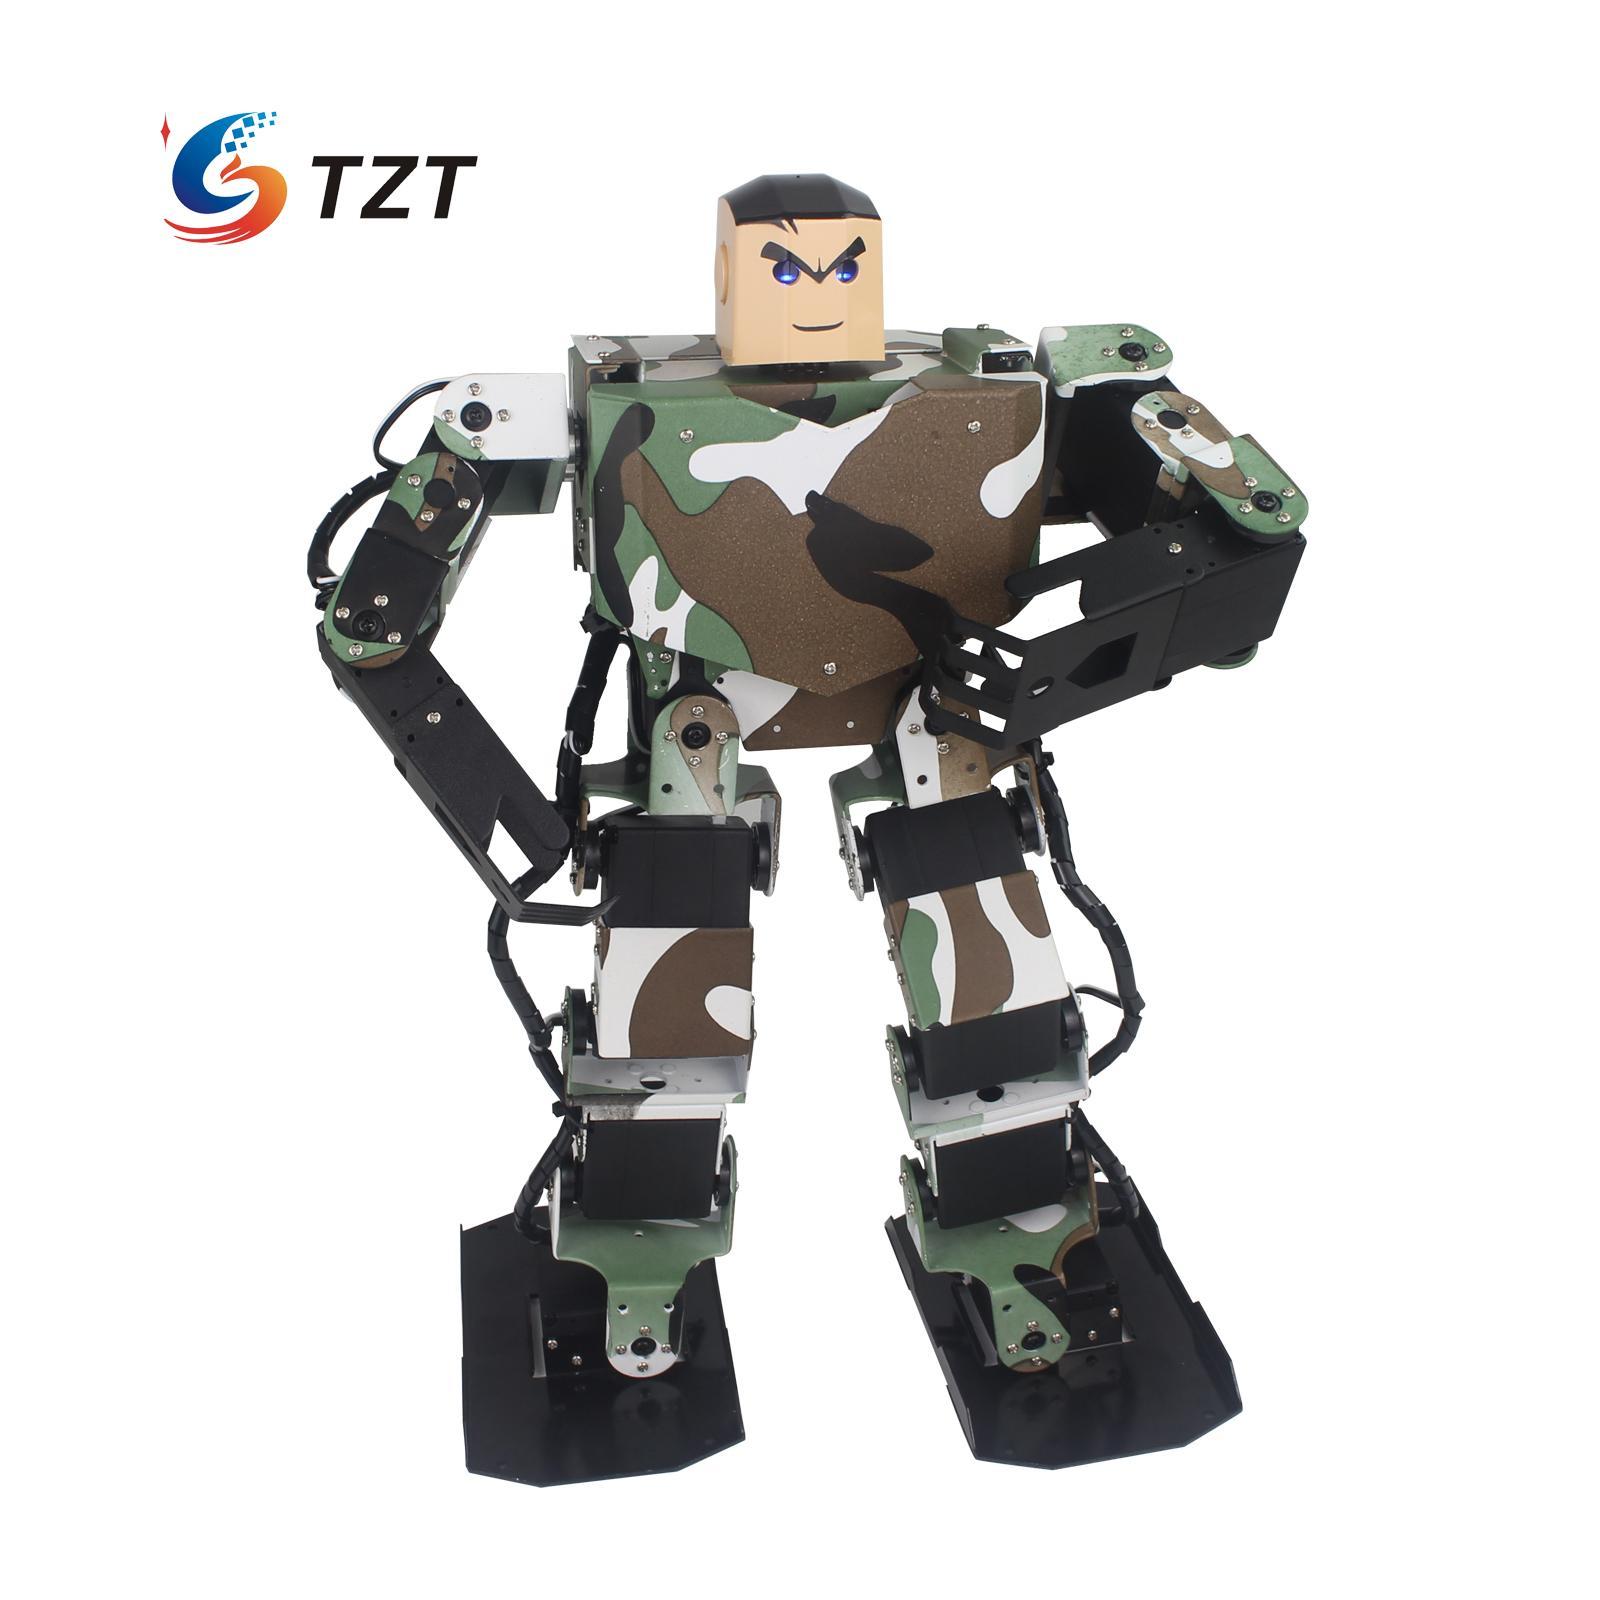 Soldier King 16DOF Smart Humanoid Robot Frame Kits Contest Dance Biped Robotics for DIY Unassembled soldier king 16dof smart humanoid robot frame kits contest dance biped robotics with servos for diy unassembled